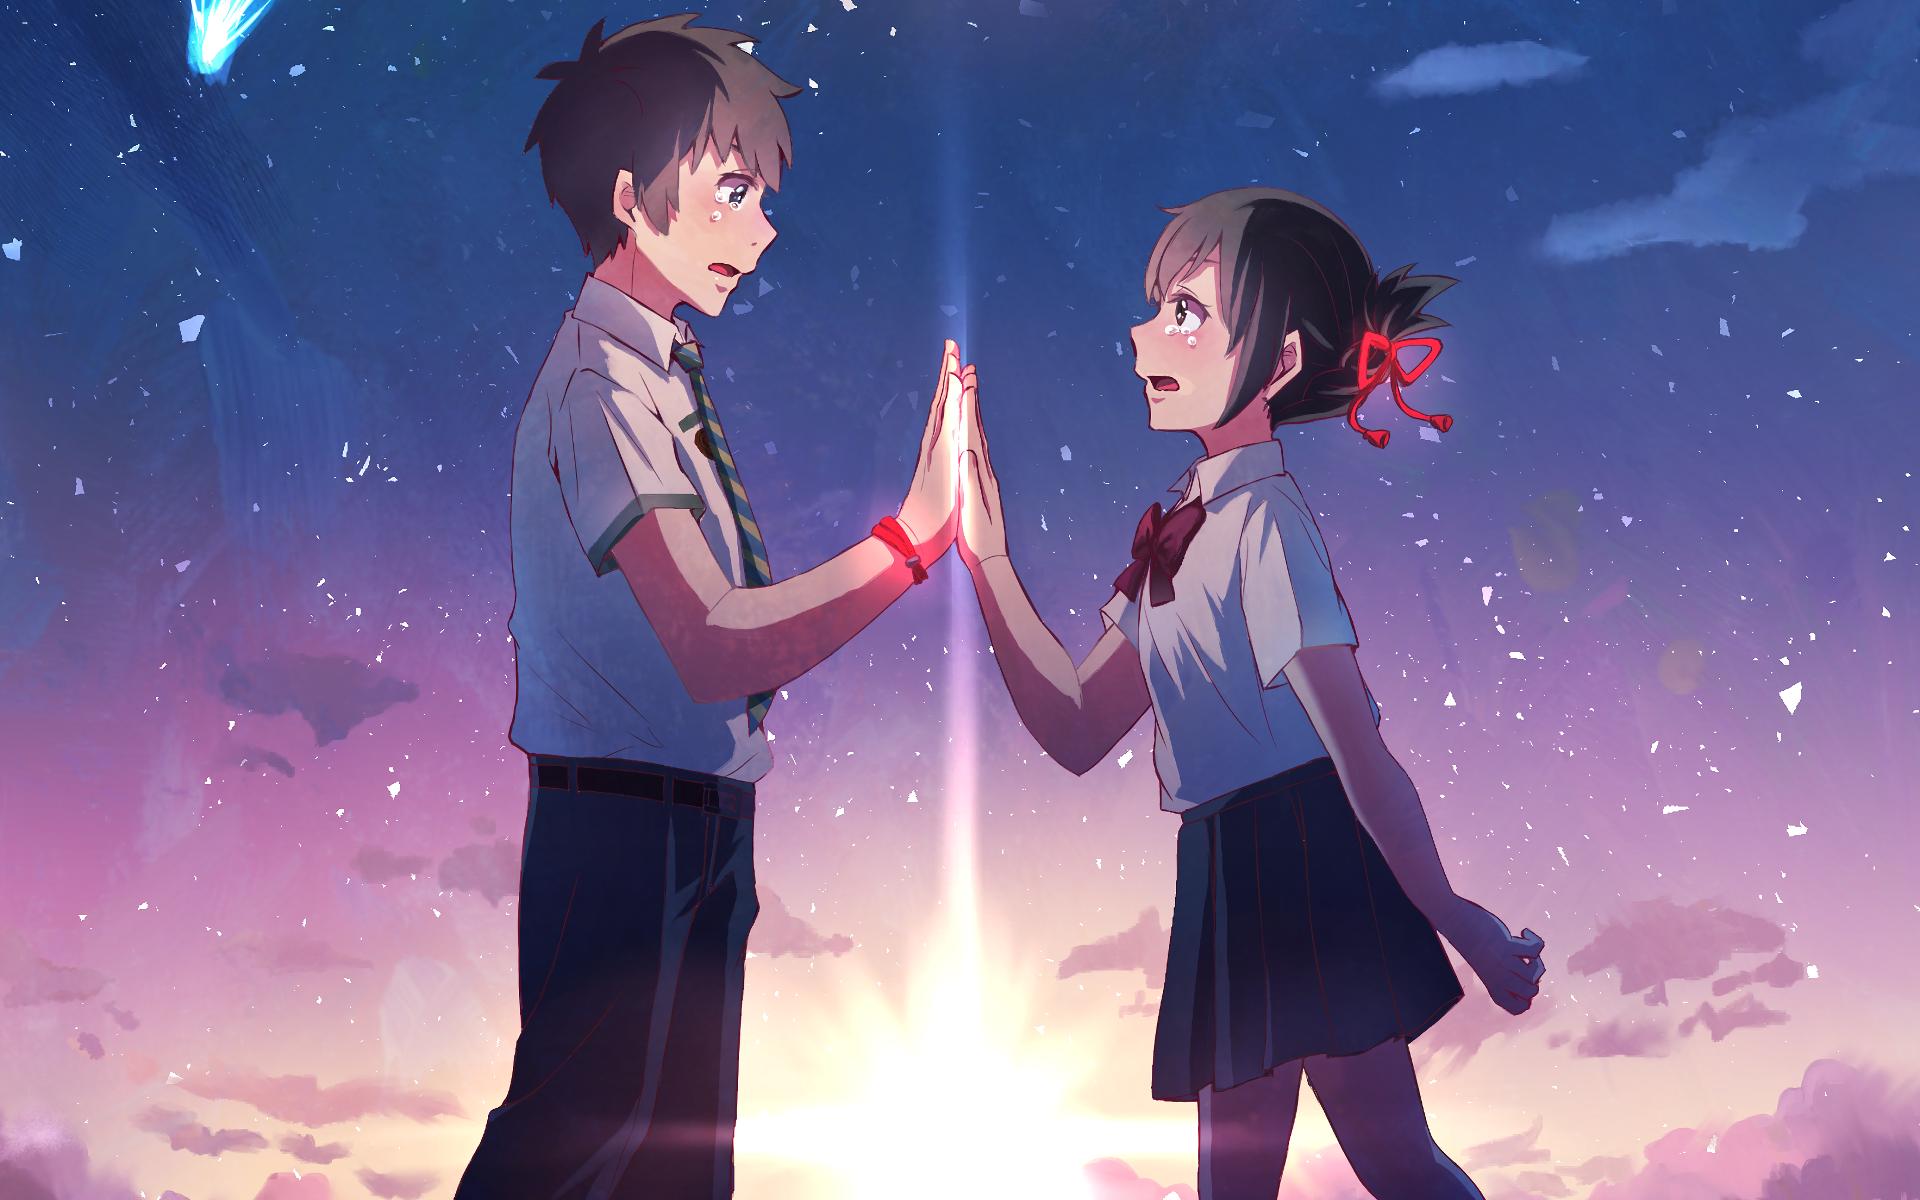 Wow 29 Wallpaper Anime Wa https//ift.tt/3fZzQJC in 2020